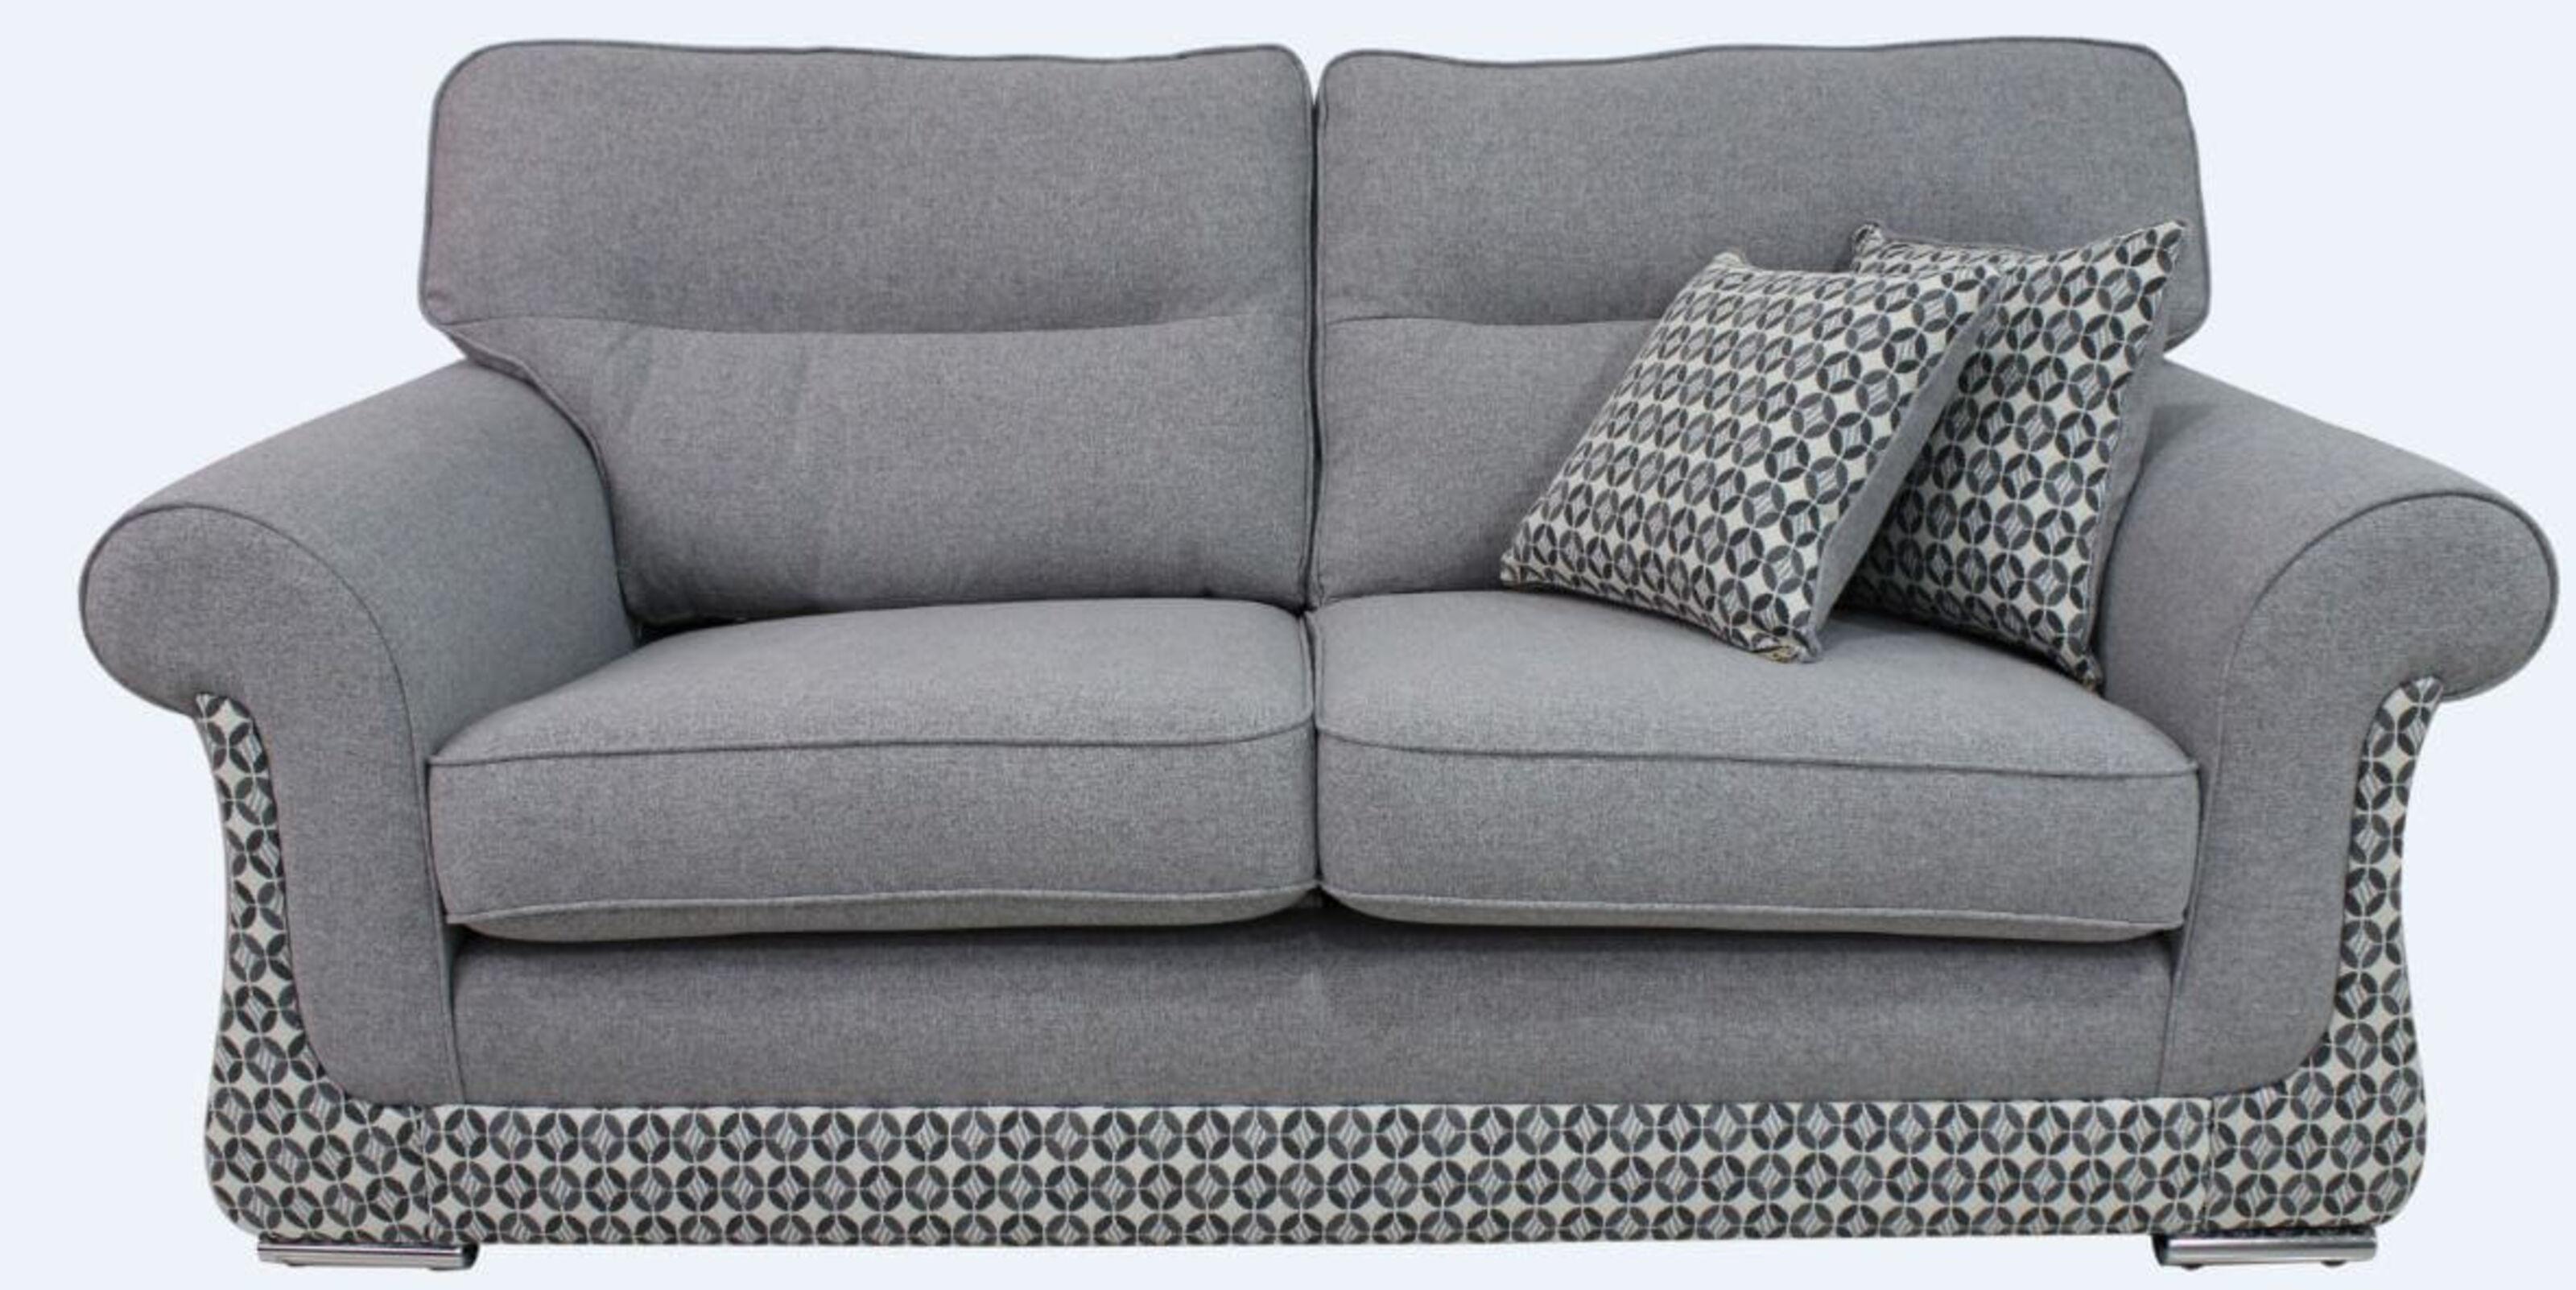 leather sofa nova scotia natuzzi beige halifax stkittsvilla